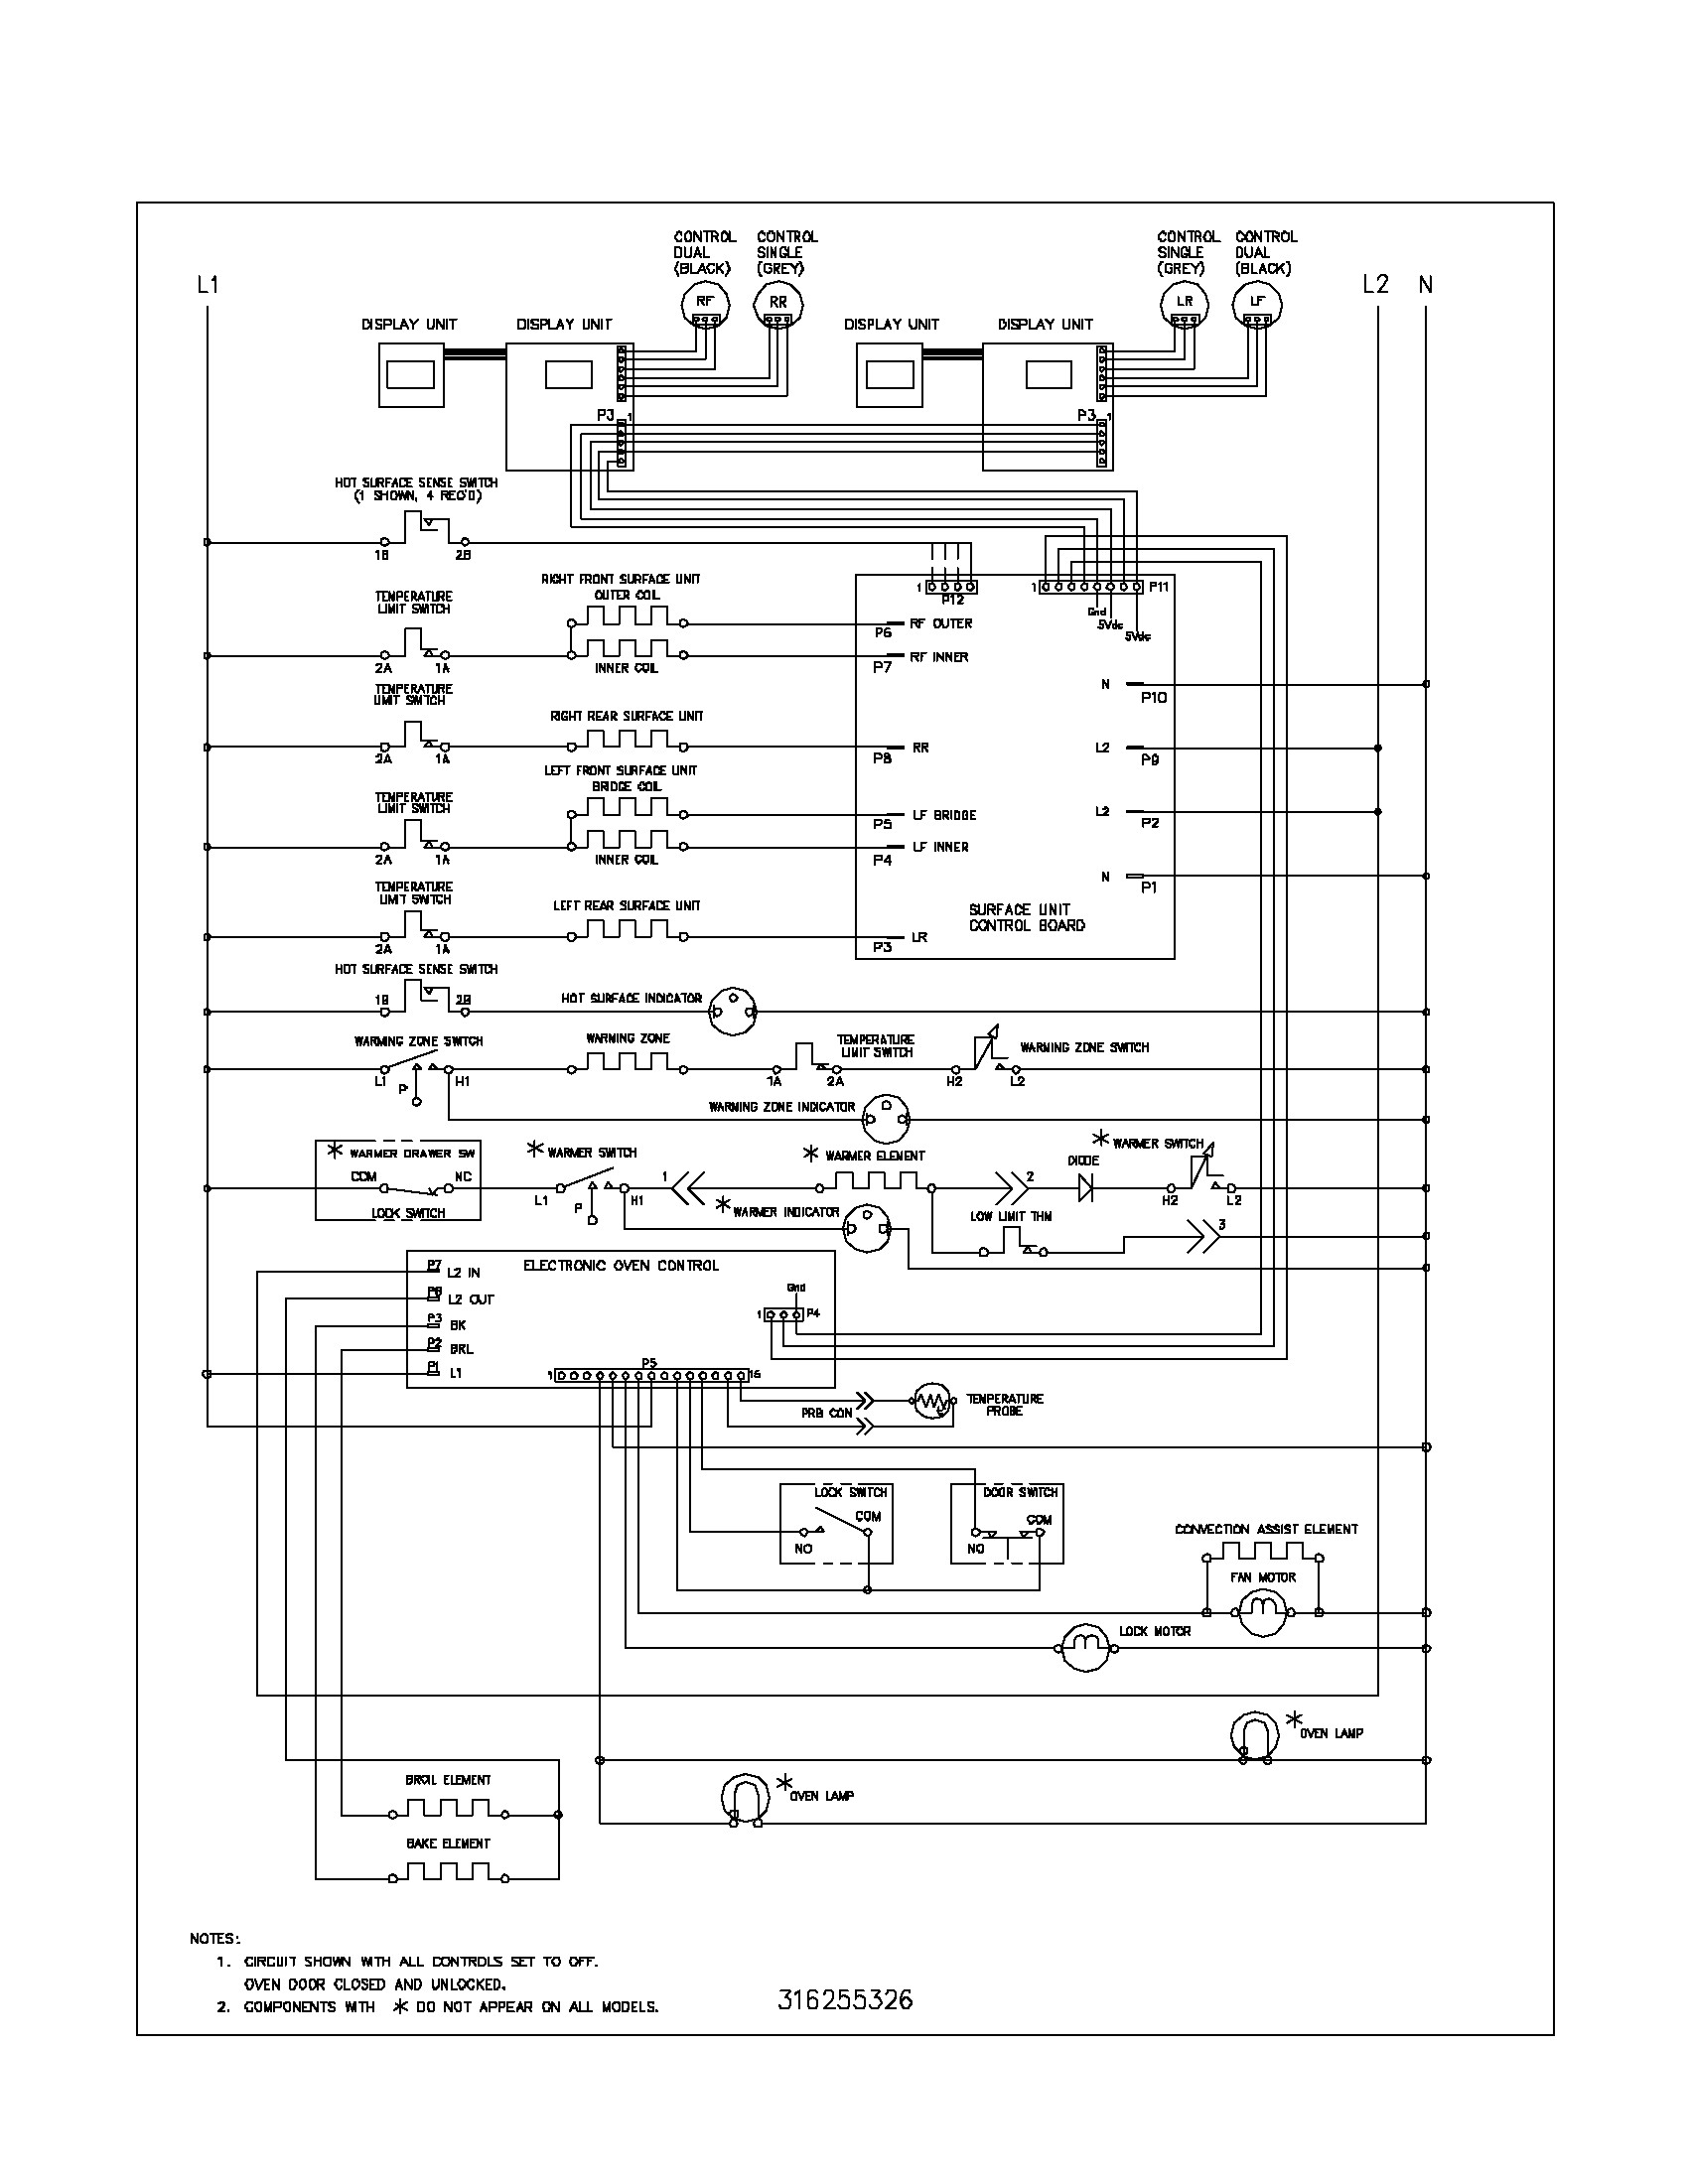 Basic Wiring For Ga Furnace